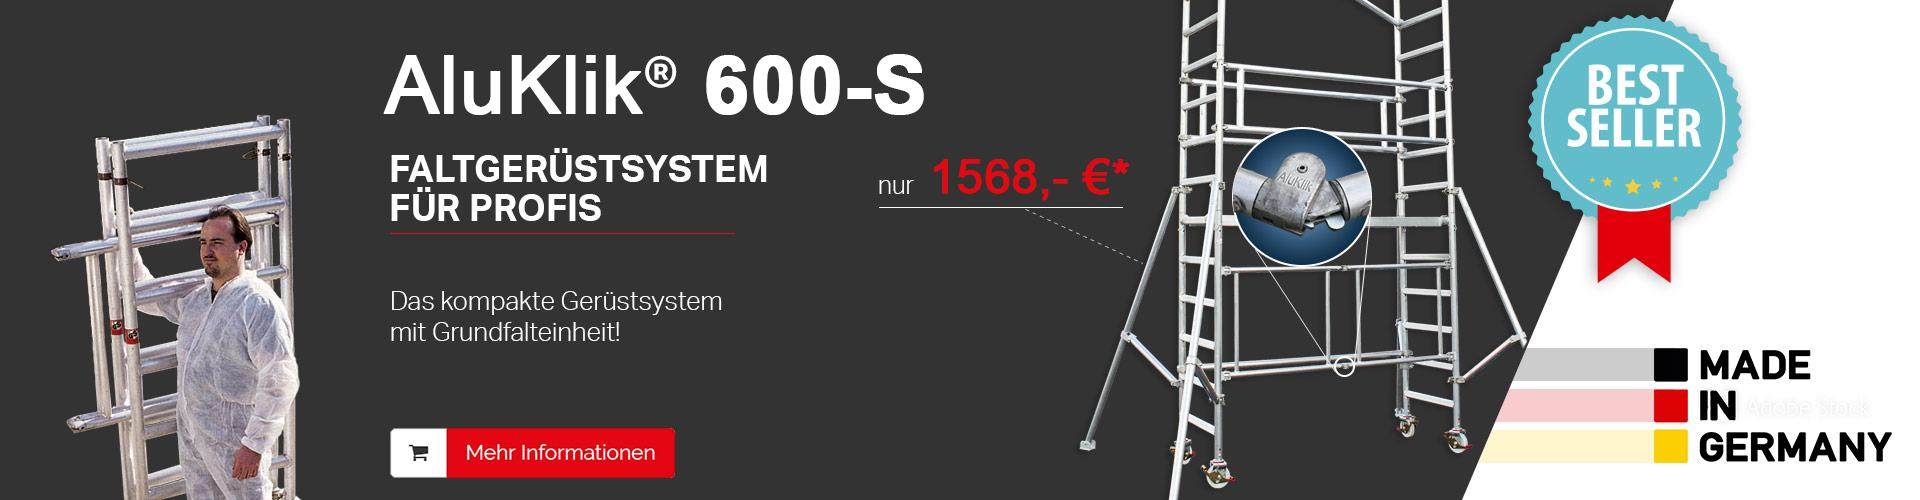 AluKlik 600-S Banner 3